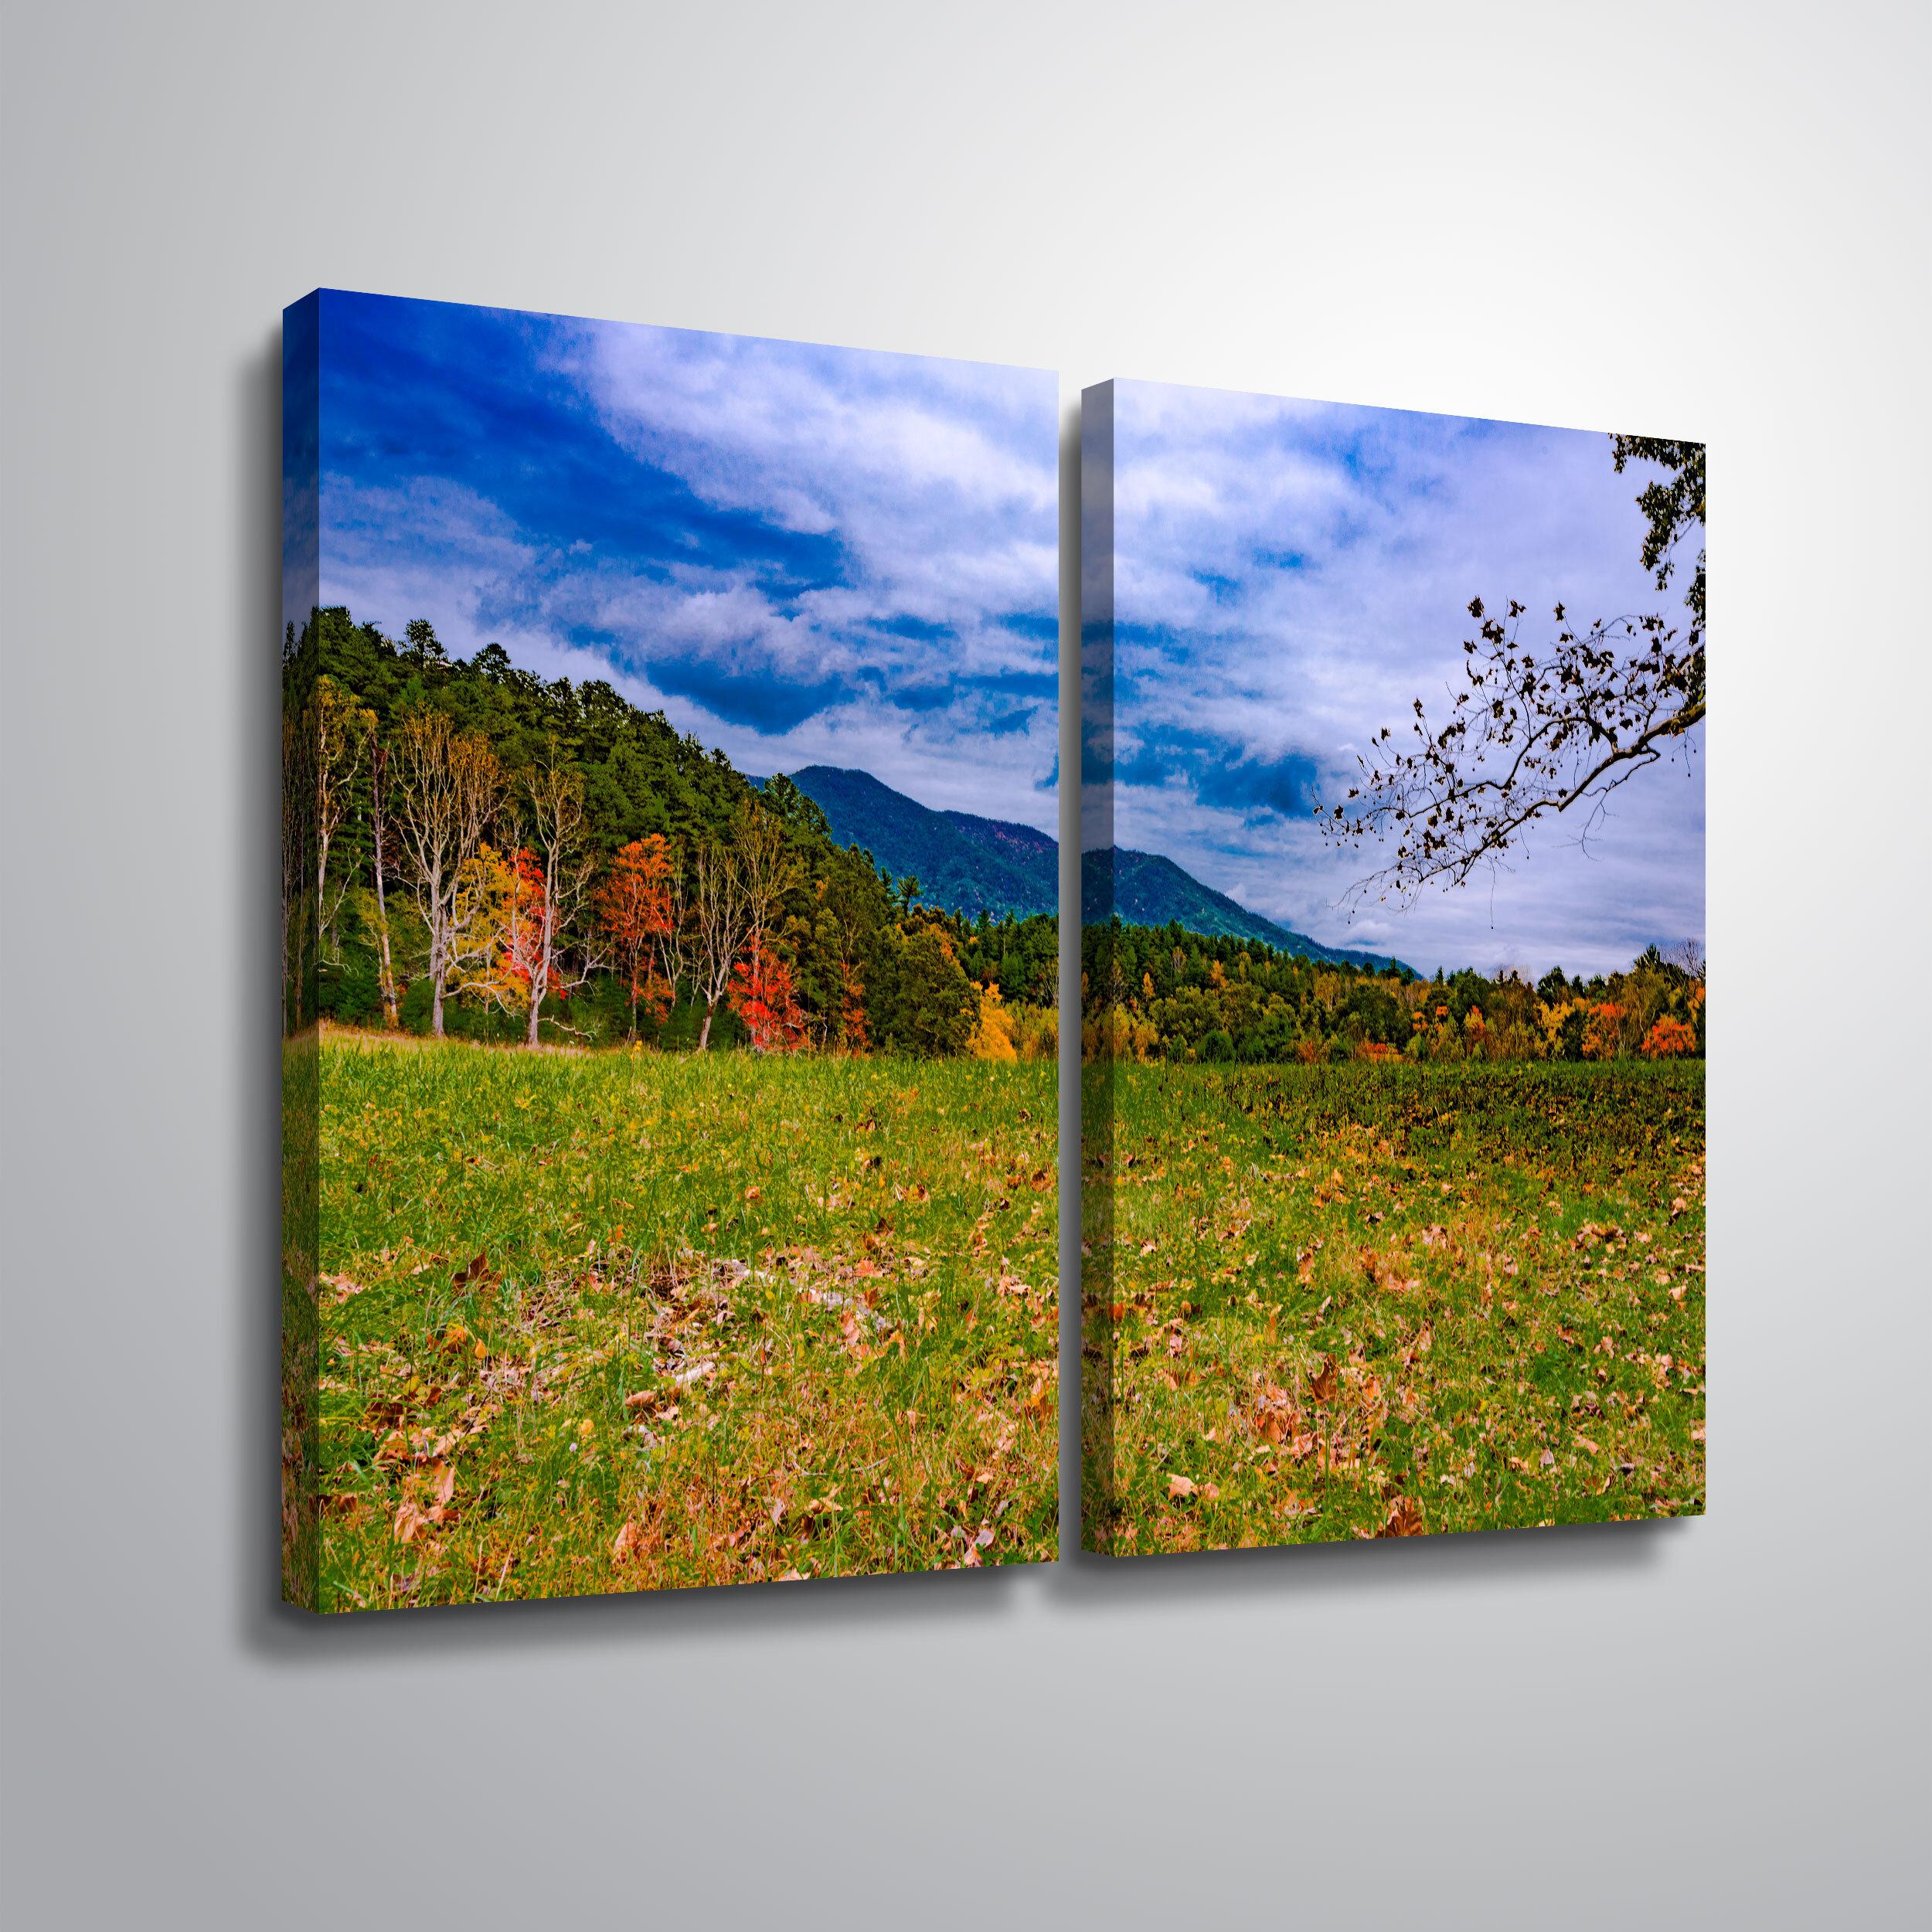 2 Piece Meadow Canvas Art You Ll Love In 2021 Wayfair